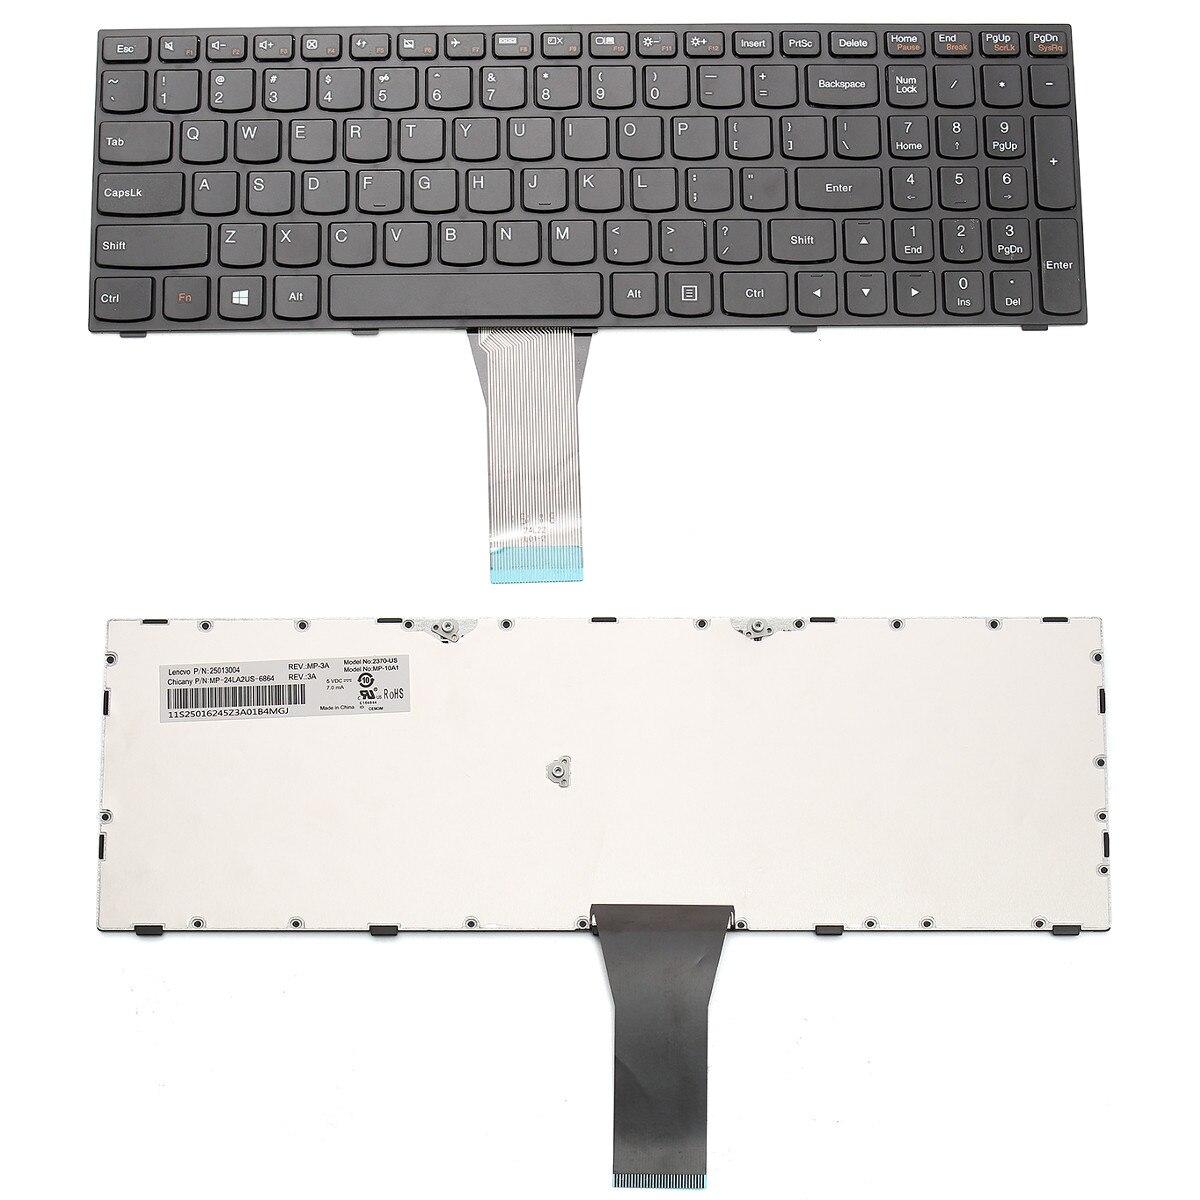 New For Lenovo B50-30 G50-30 G50-45 G50-70 G50-80 Z50-70 Laptop Keyboard 25214785 Key Caps Sets Late 2017 Mid 2018